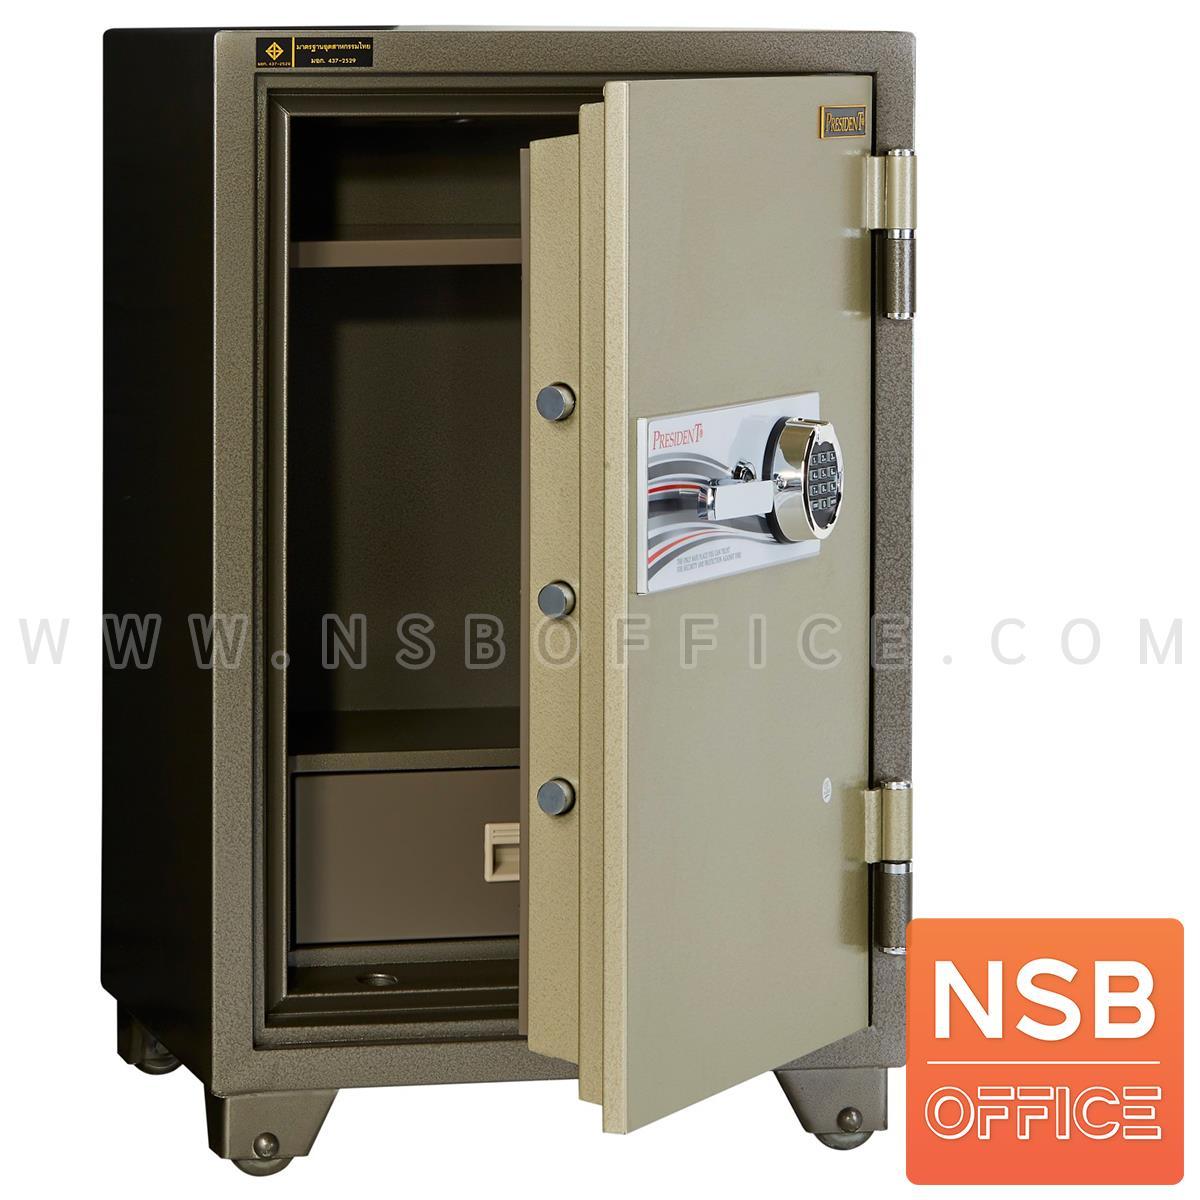 F05A082:ตู้เซฟนิรภัยดิจิตอลระบบสแกนนิ้วมือ 190 กก.  รุ่น PRESIDENT-SB40DF 1 กุญแจ 1 รหัส